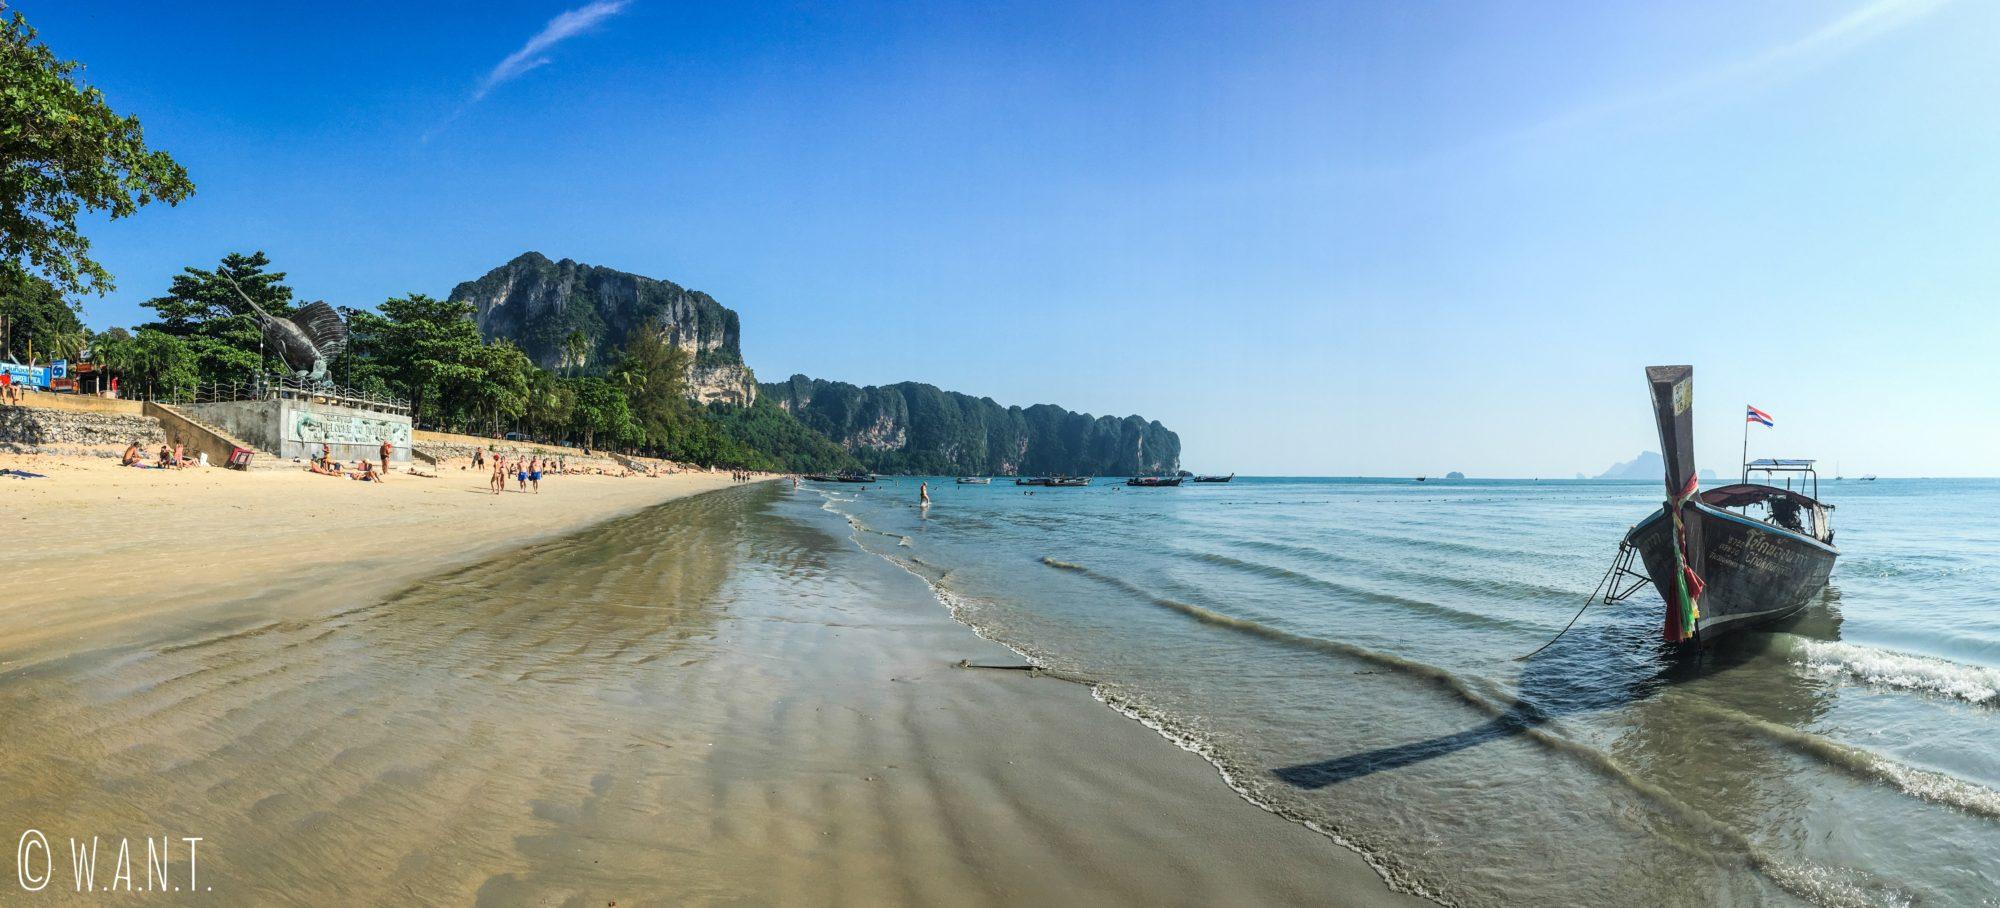 Panorama de la plage de Ao Nang dans la province de Krabi